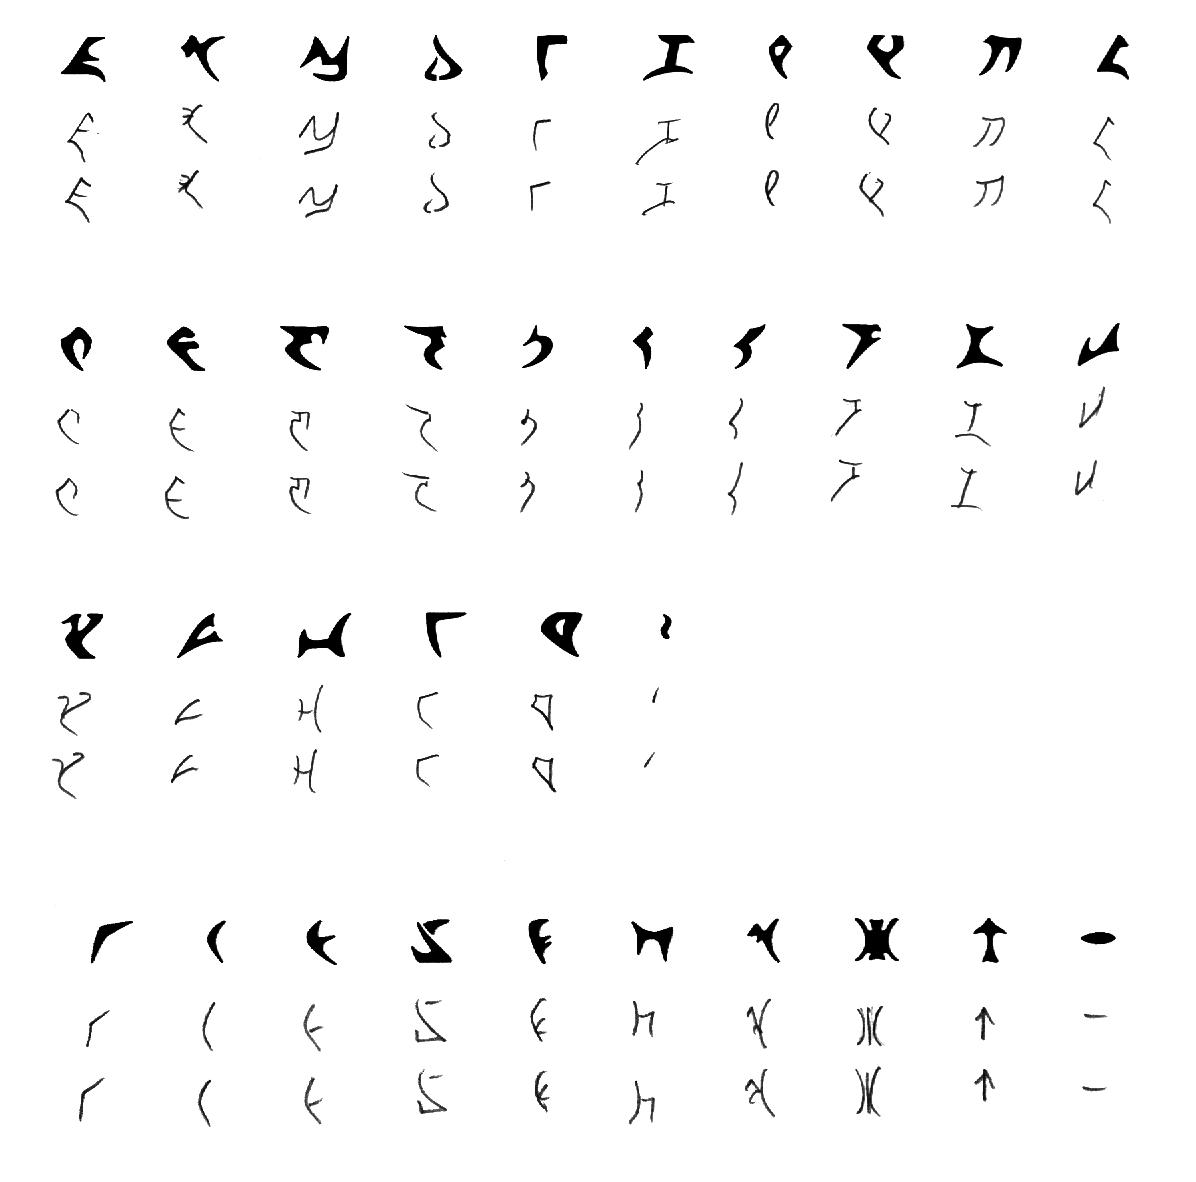 Some Pictures Of PIqaD Klingonska Akademien